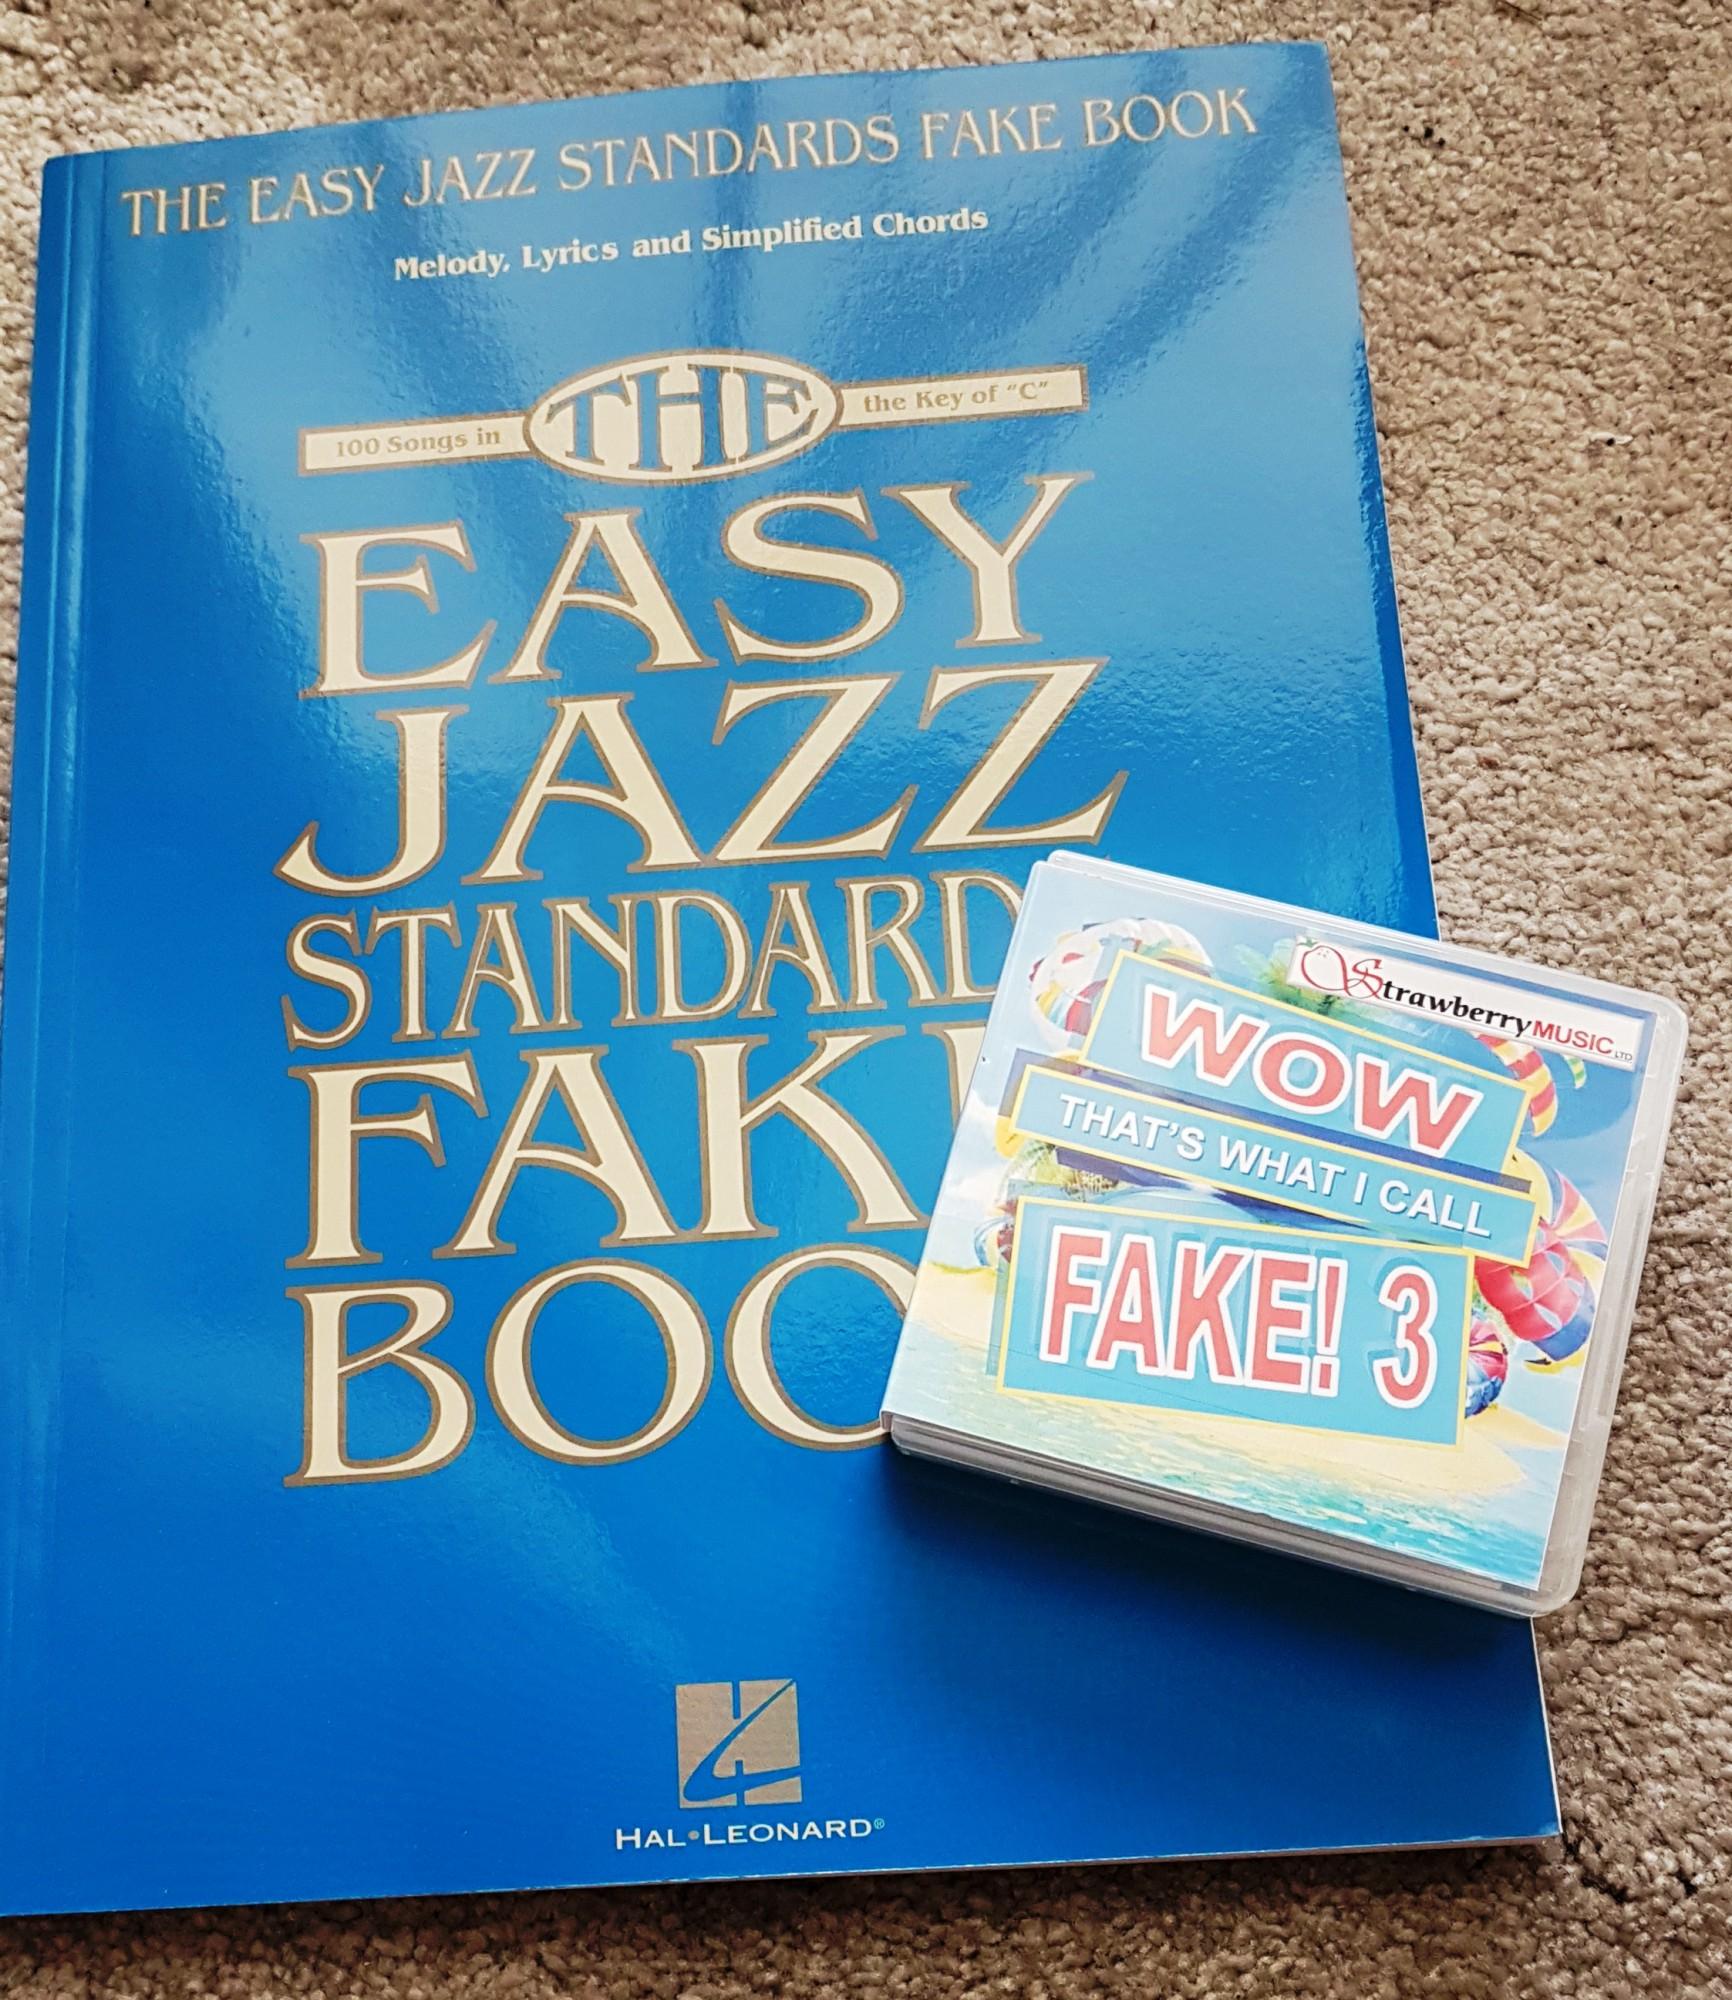 Wow, Thats What I Call Fake Vol  3 Book And Usb   Yamaha